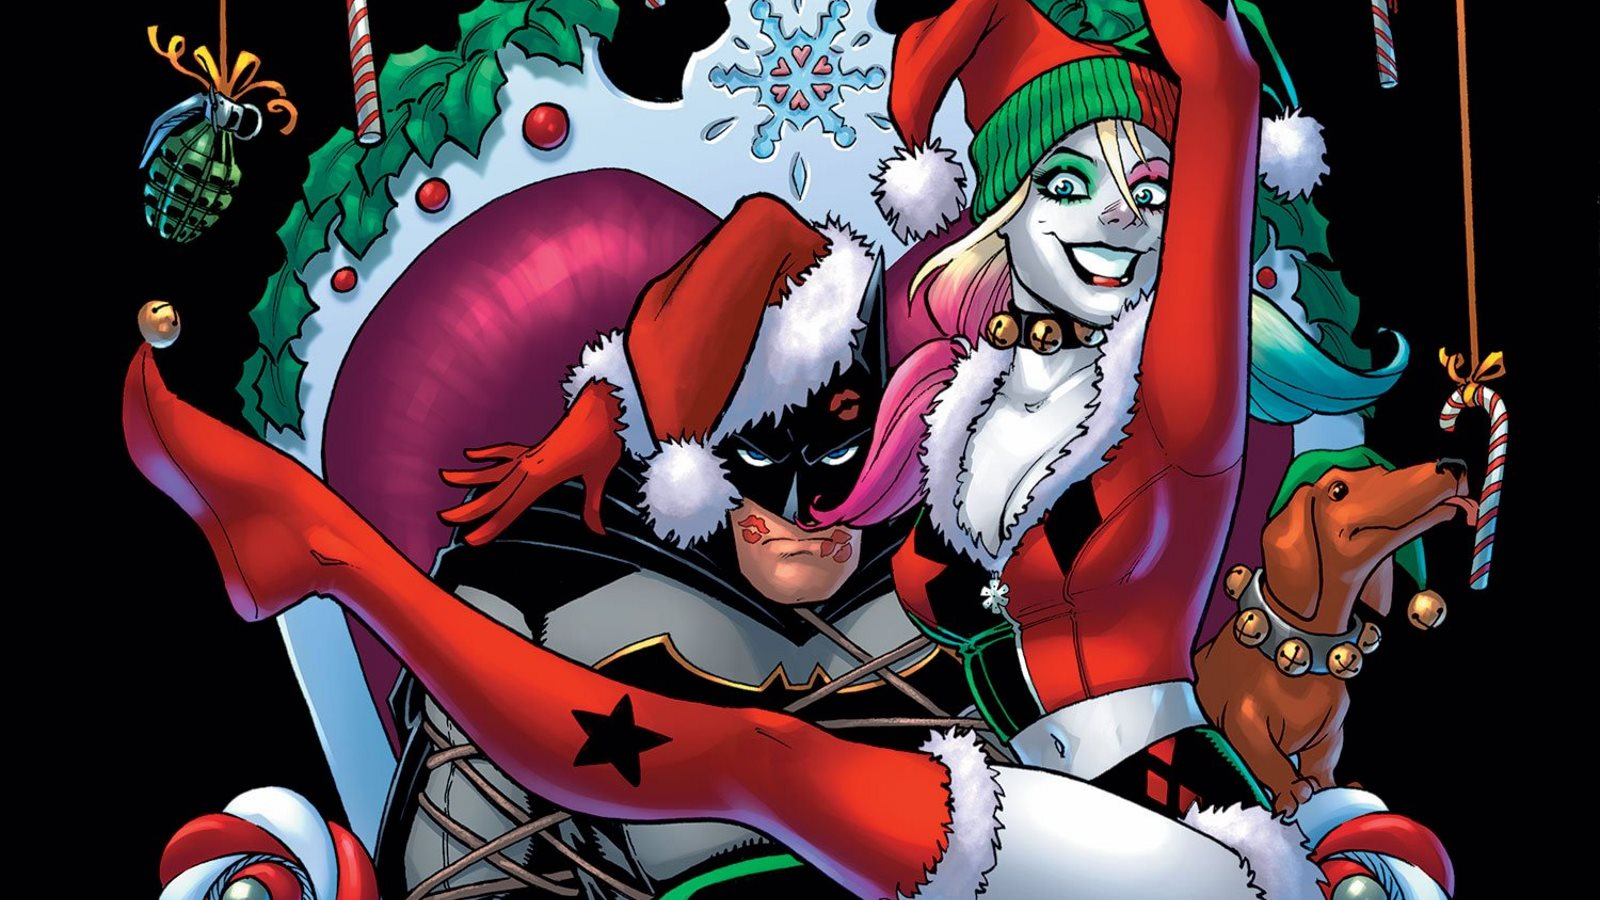 161 Hasta Los Villanos De Dc Comics Festejan La Navidad